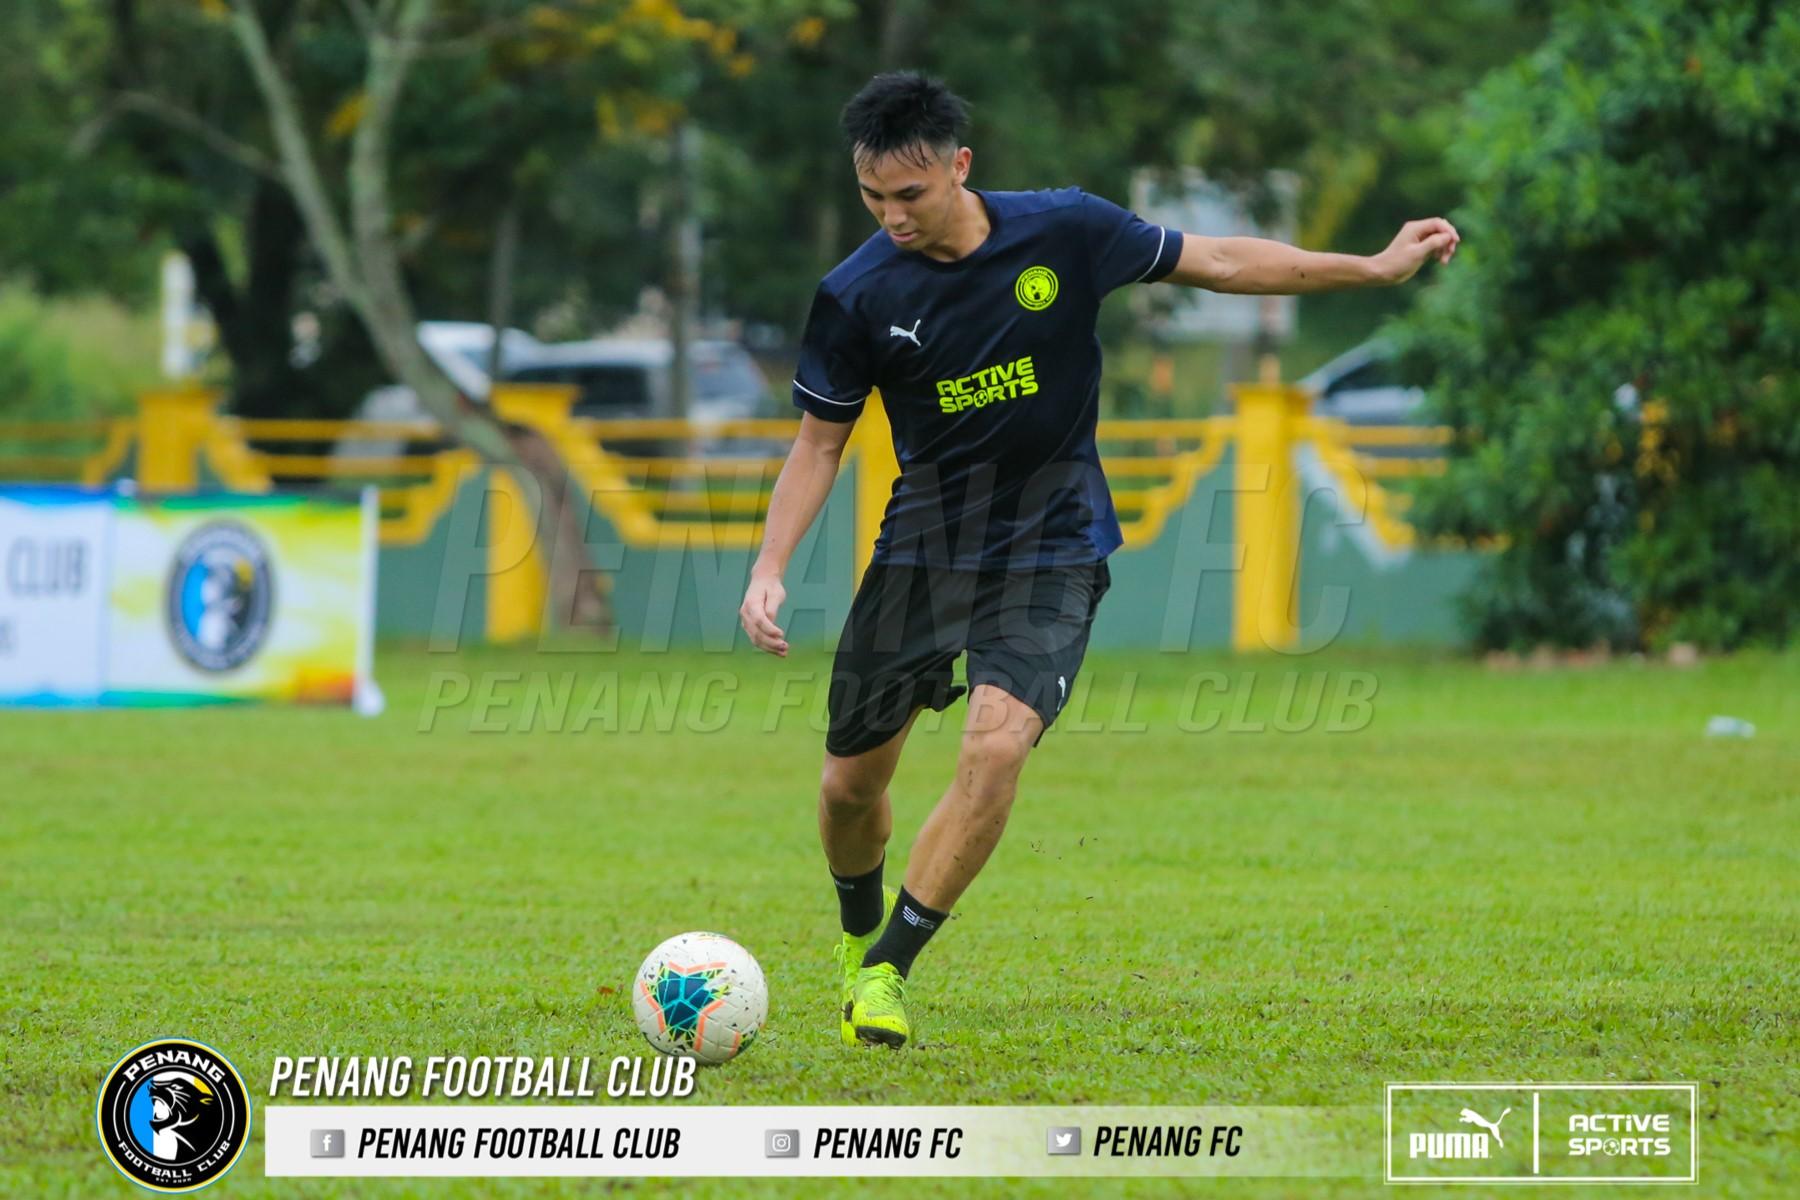 Quentin Cheng Penang FC 2021